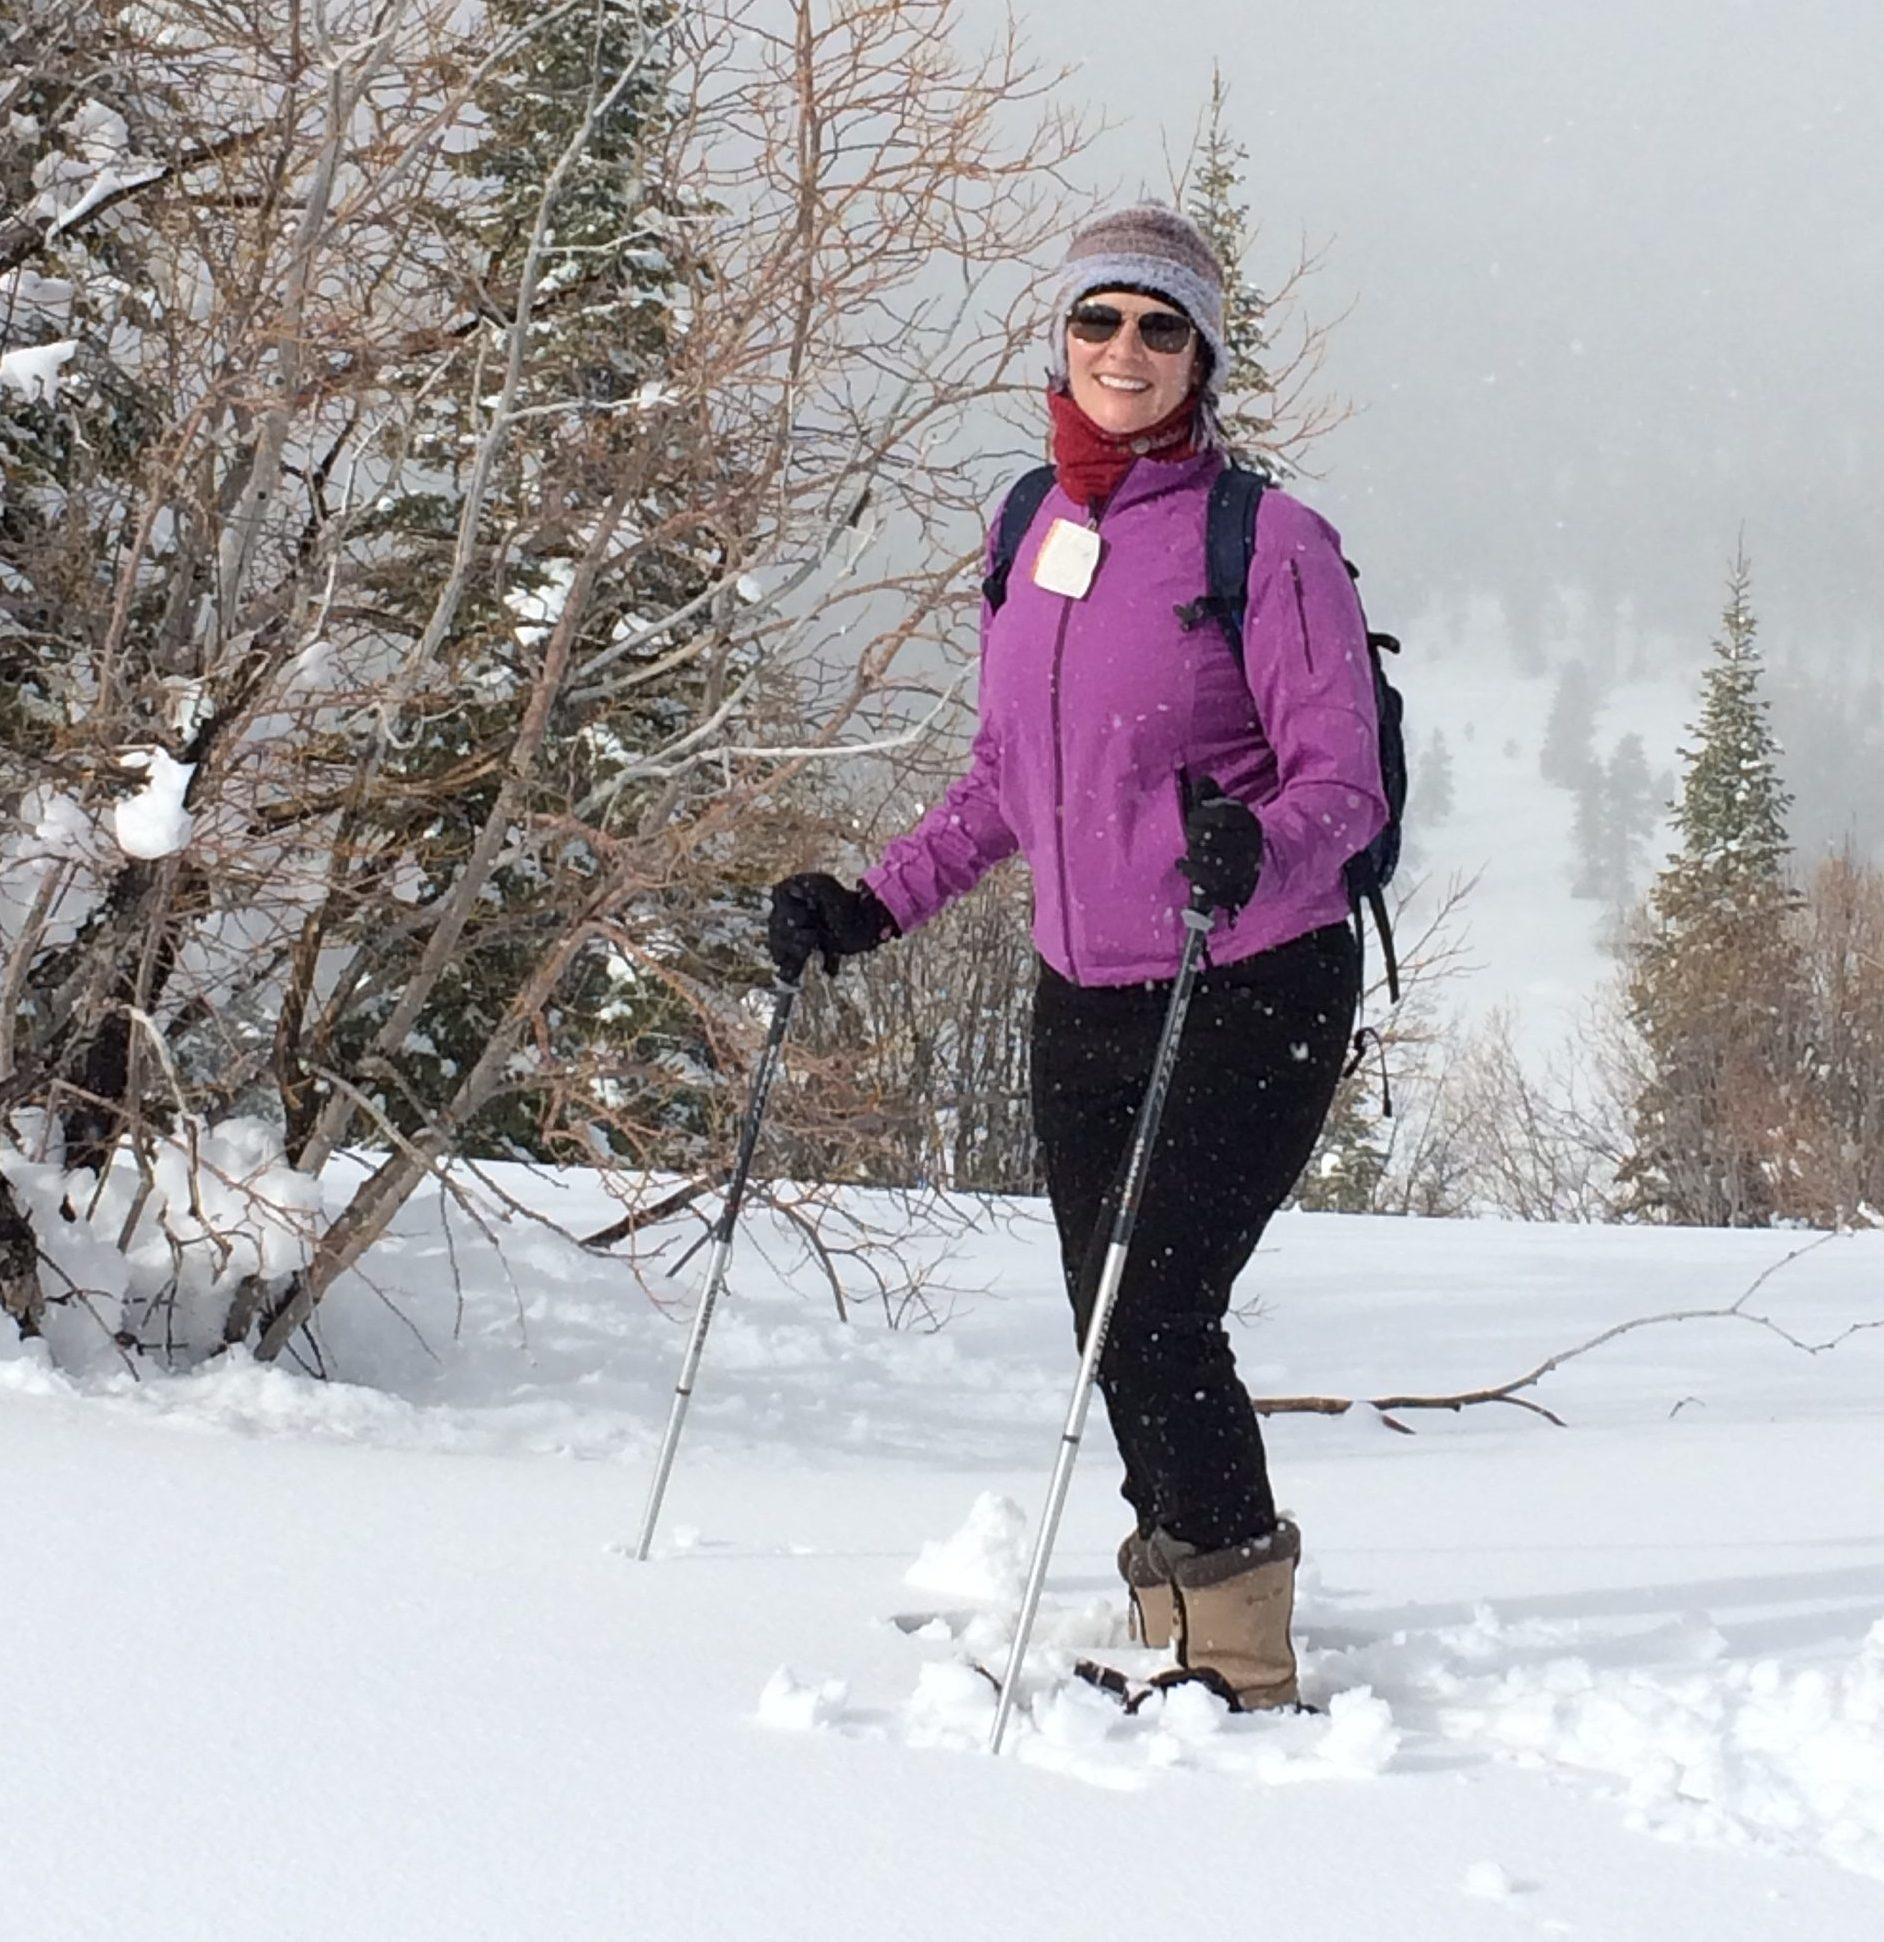 Snowshoeing in Truckee